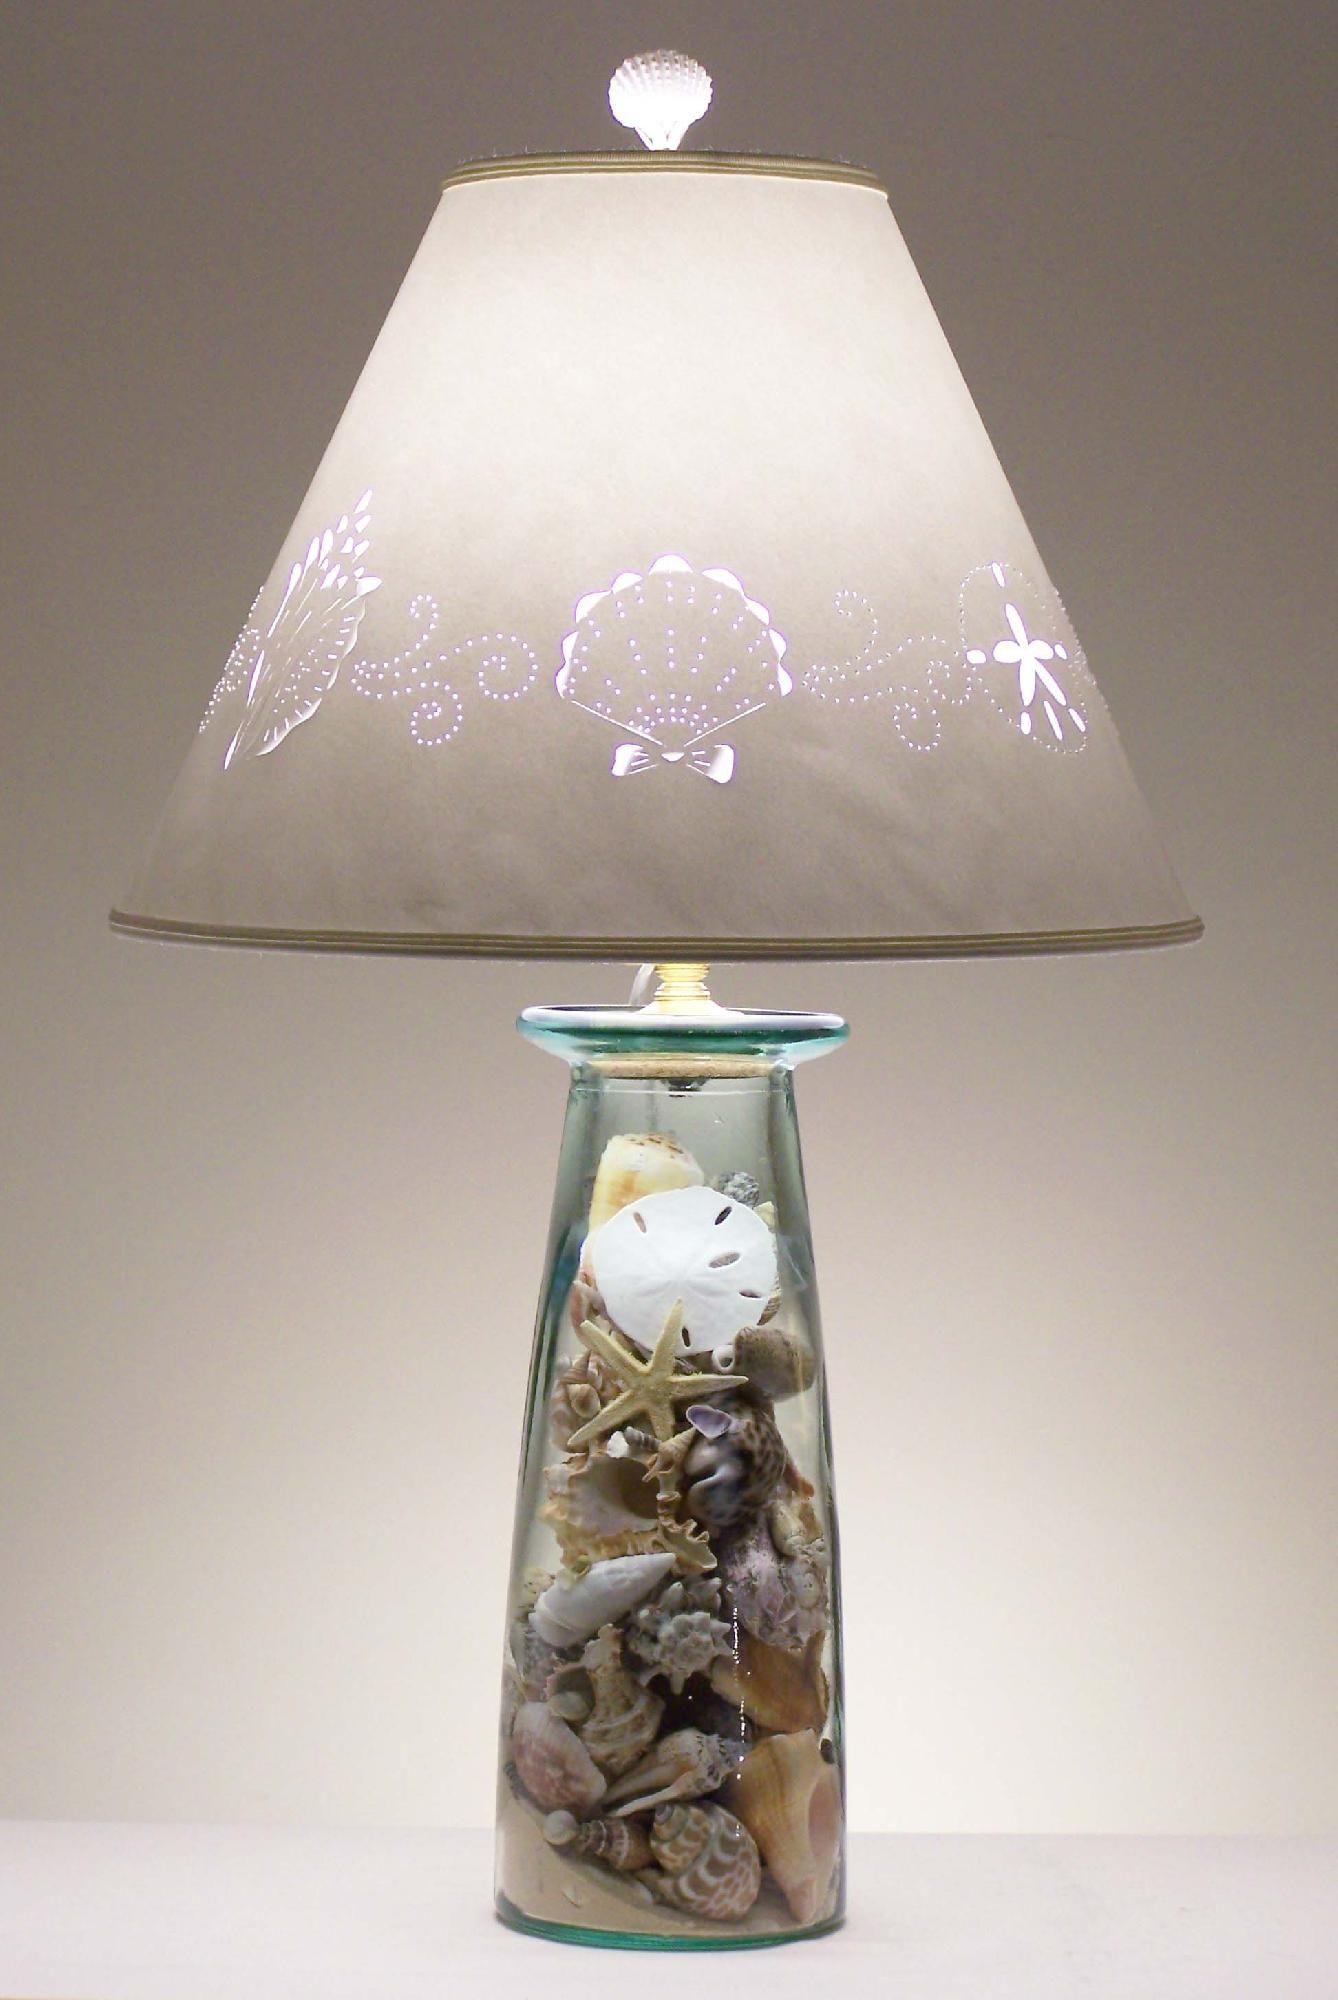 How To Make A Seashell Lamp Seashells Lamp Beach Themed Room